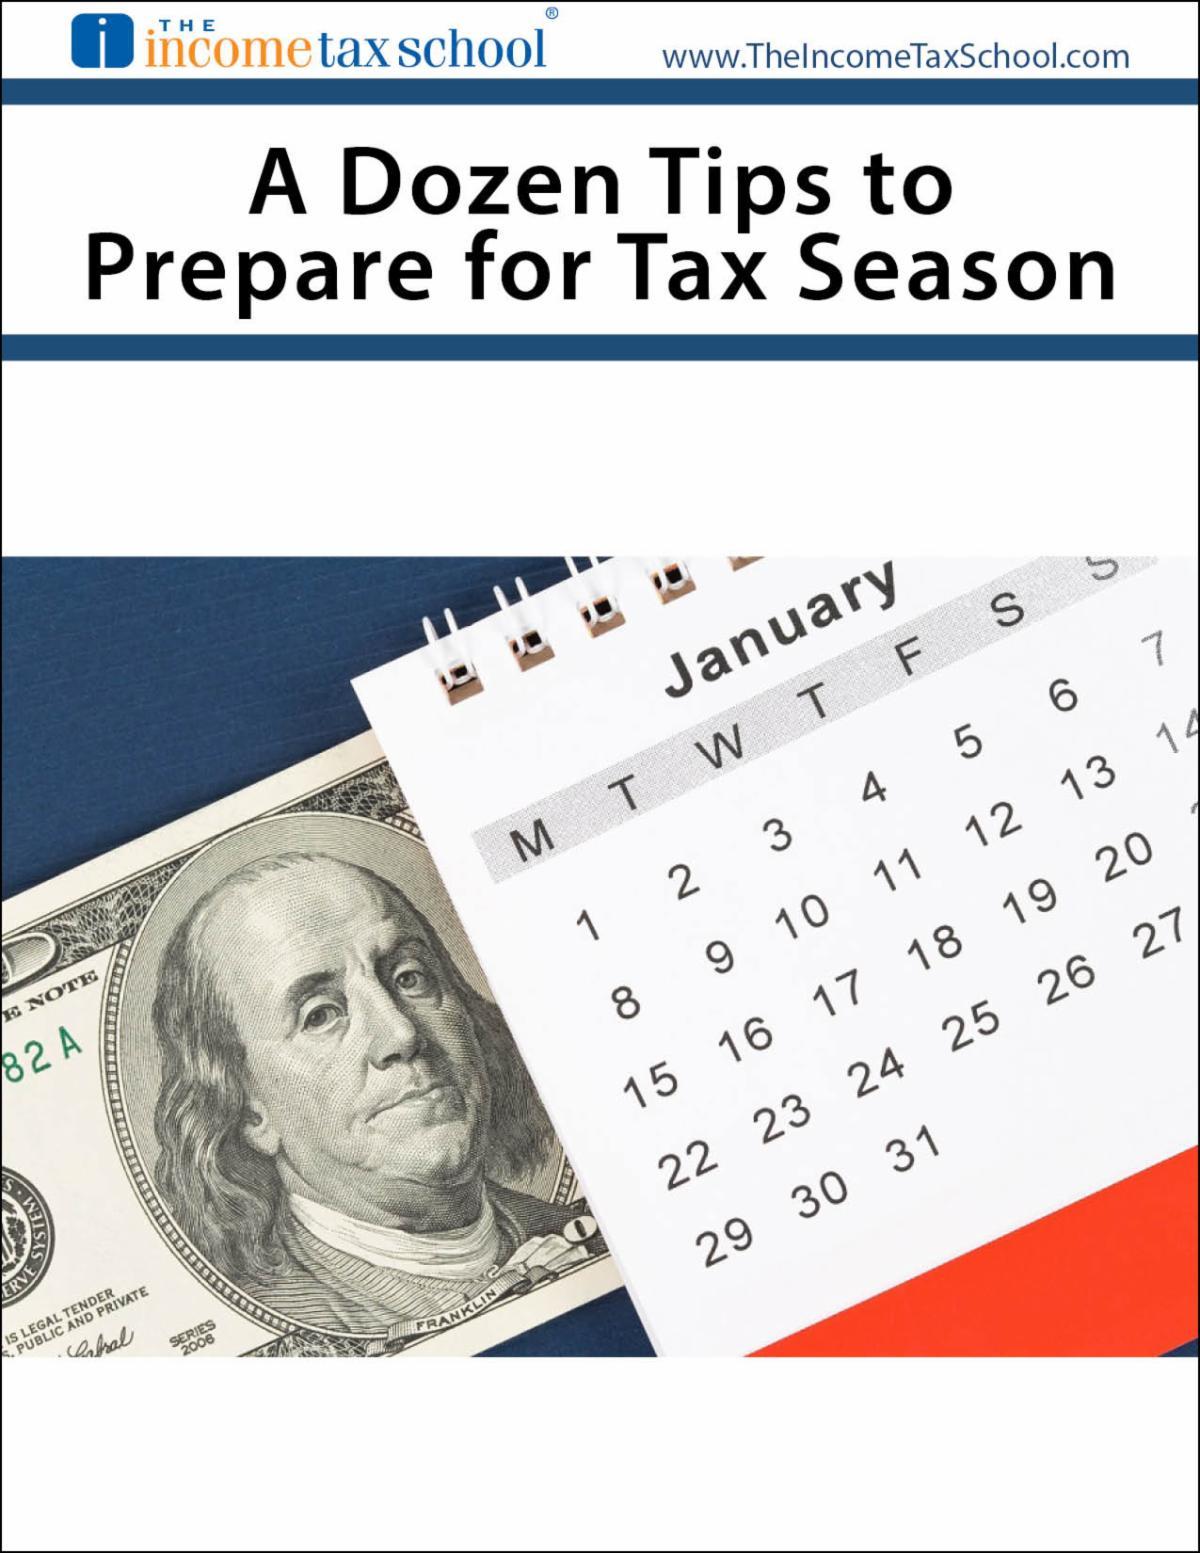 A-Dozen-Tips-to-Prepare-for-Tax-Season.jpg